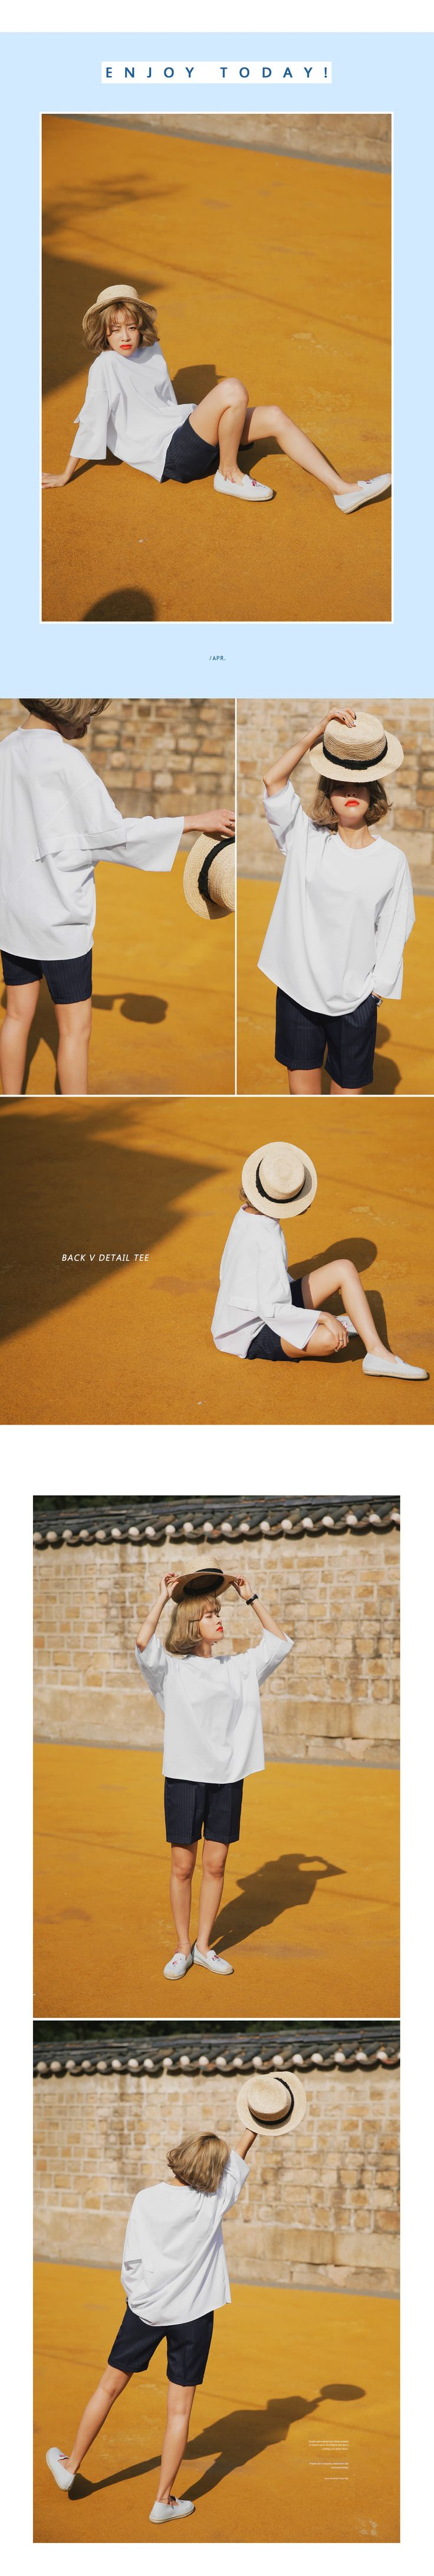 2TYPEウエストストリングハーフパンツ・全9色パンツ・ズボンパンツ・ズボン|レディースファッション通販 DHOLICディーホリック [ファストファッション 水着 ワンピース]